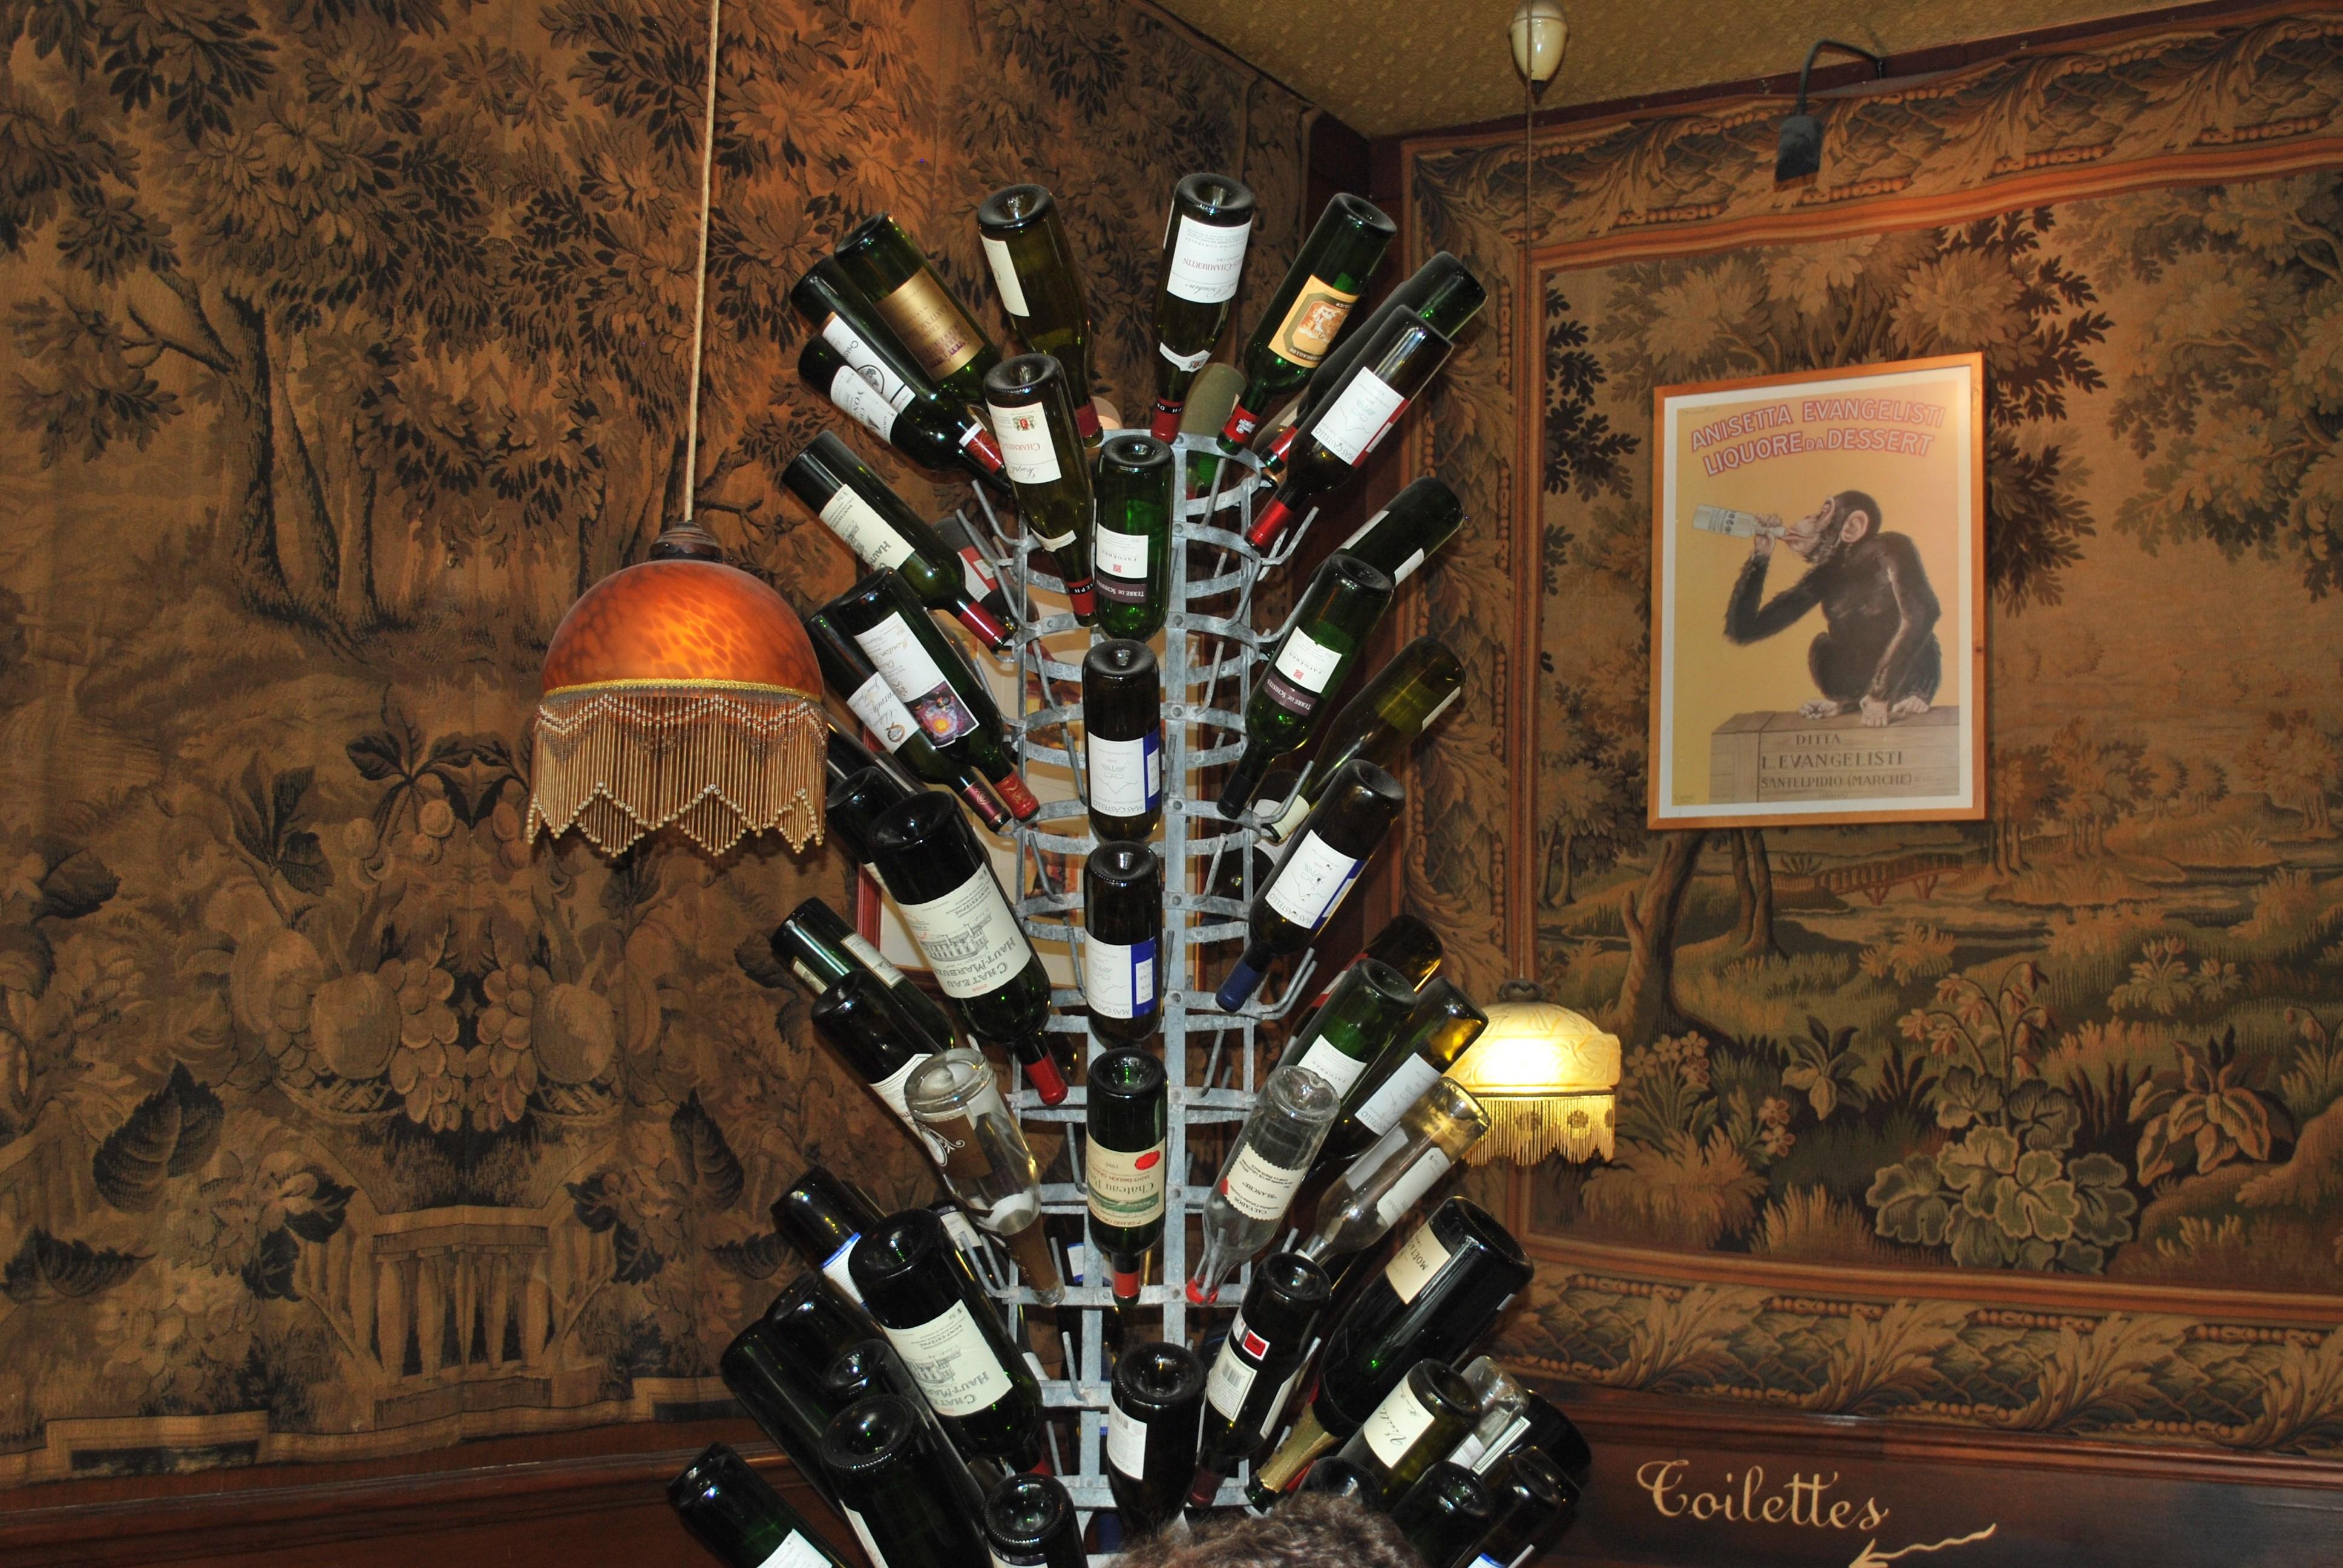 wine-bottle-rack-paris